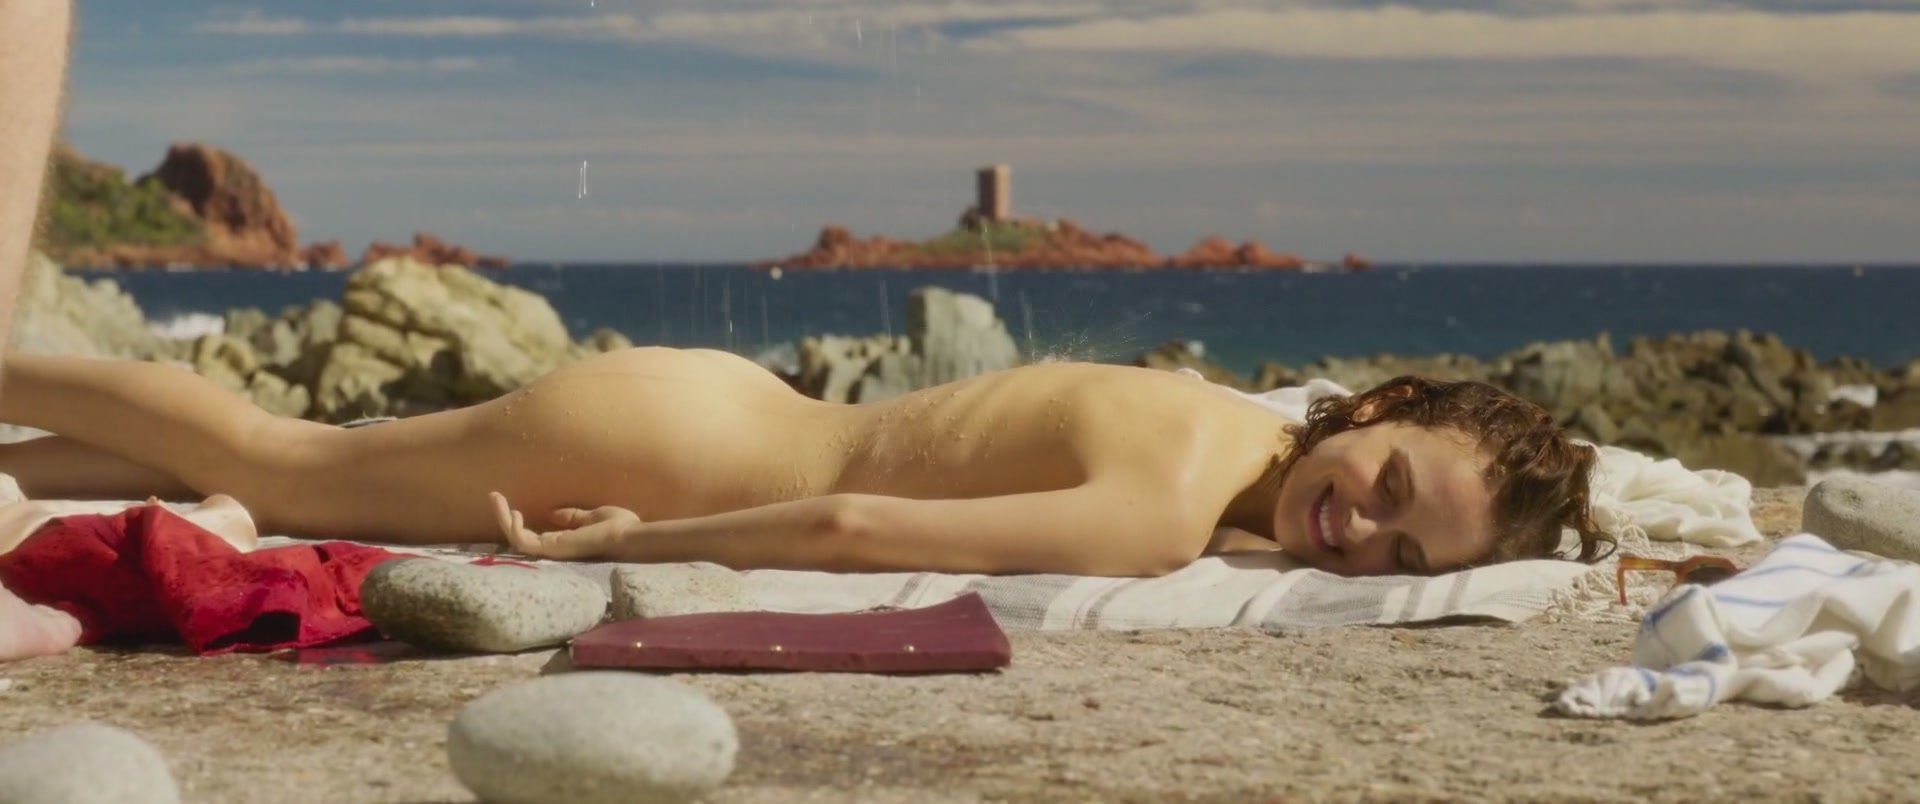 Warm Portman Natalie Naked Pic